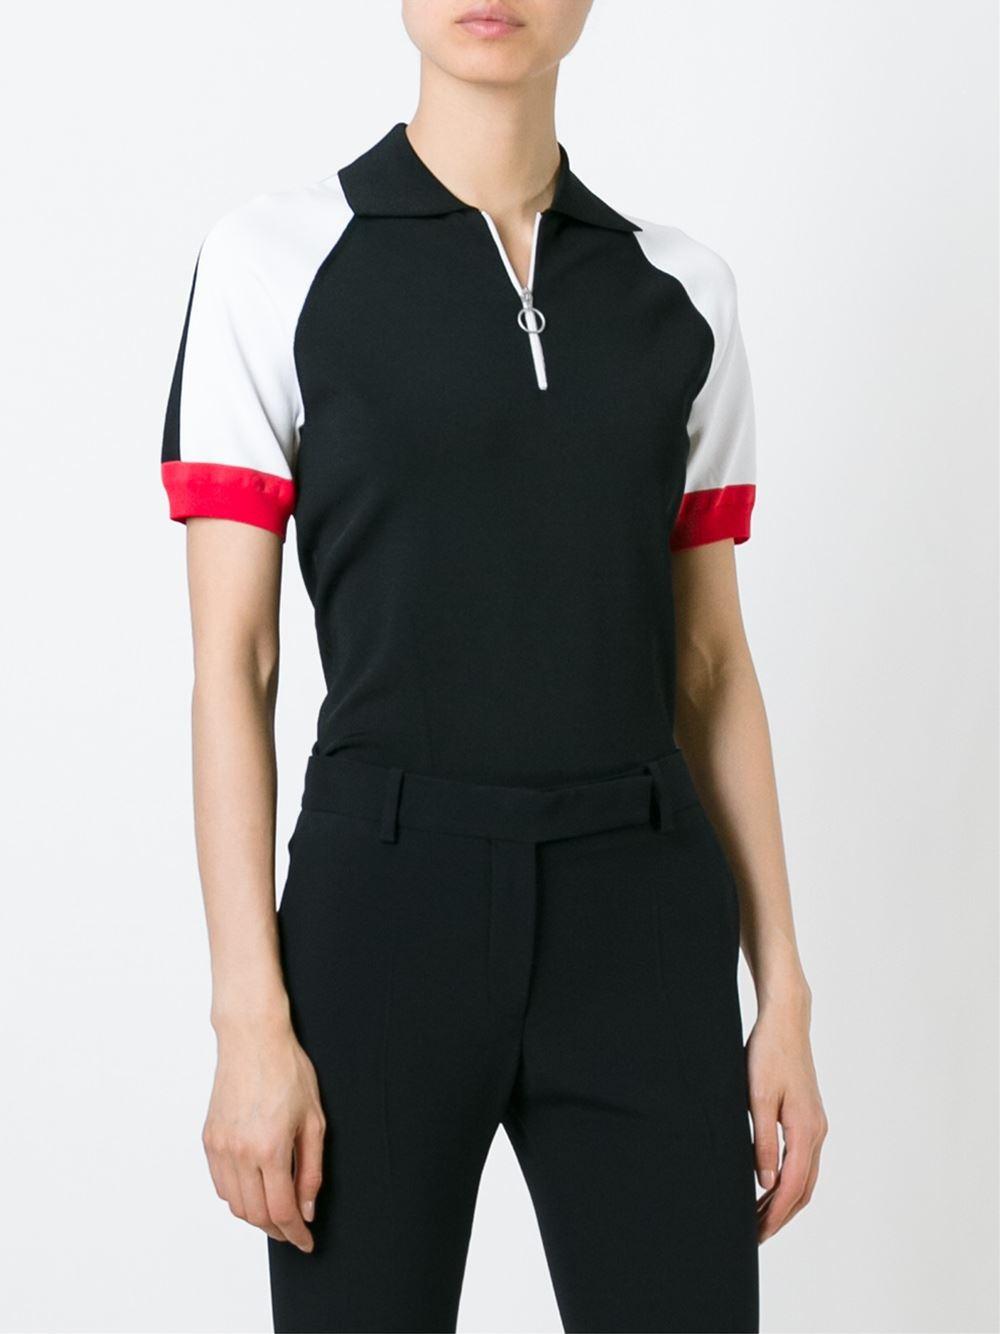 Polo majice (T by Alexander Wang, 410€, farfetch.com)